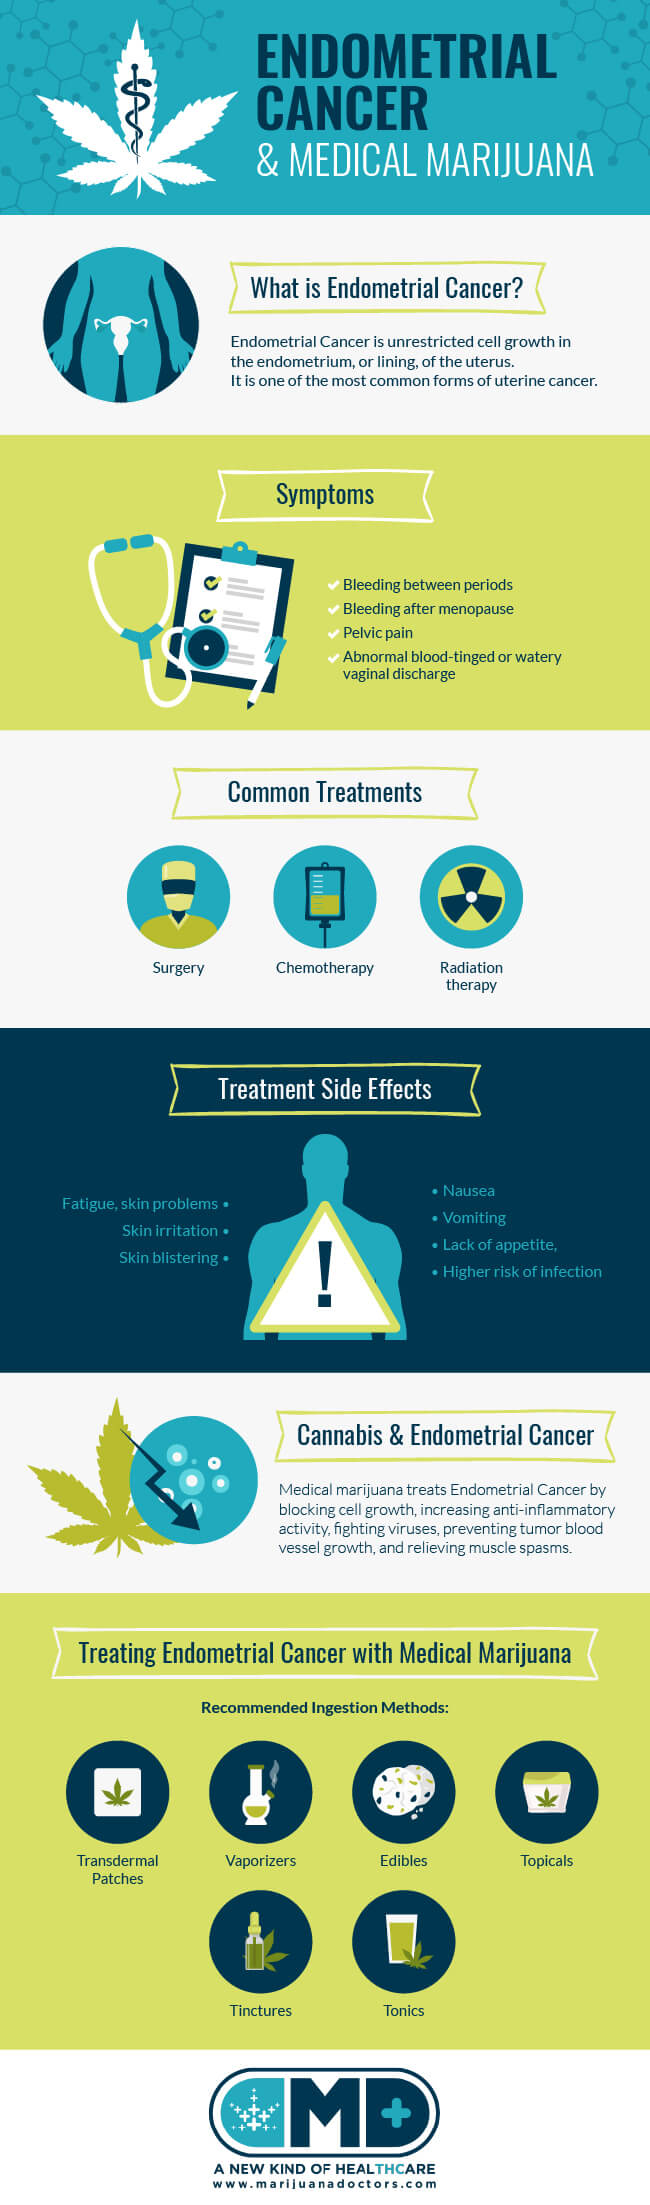 Medical Marijuana and Endometrial Cancer